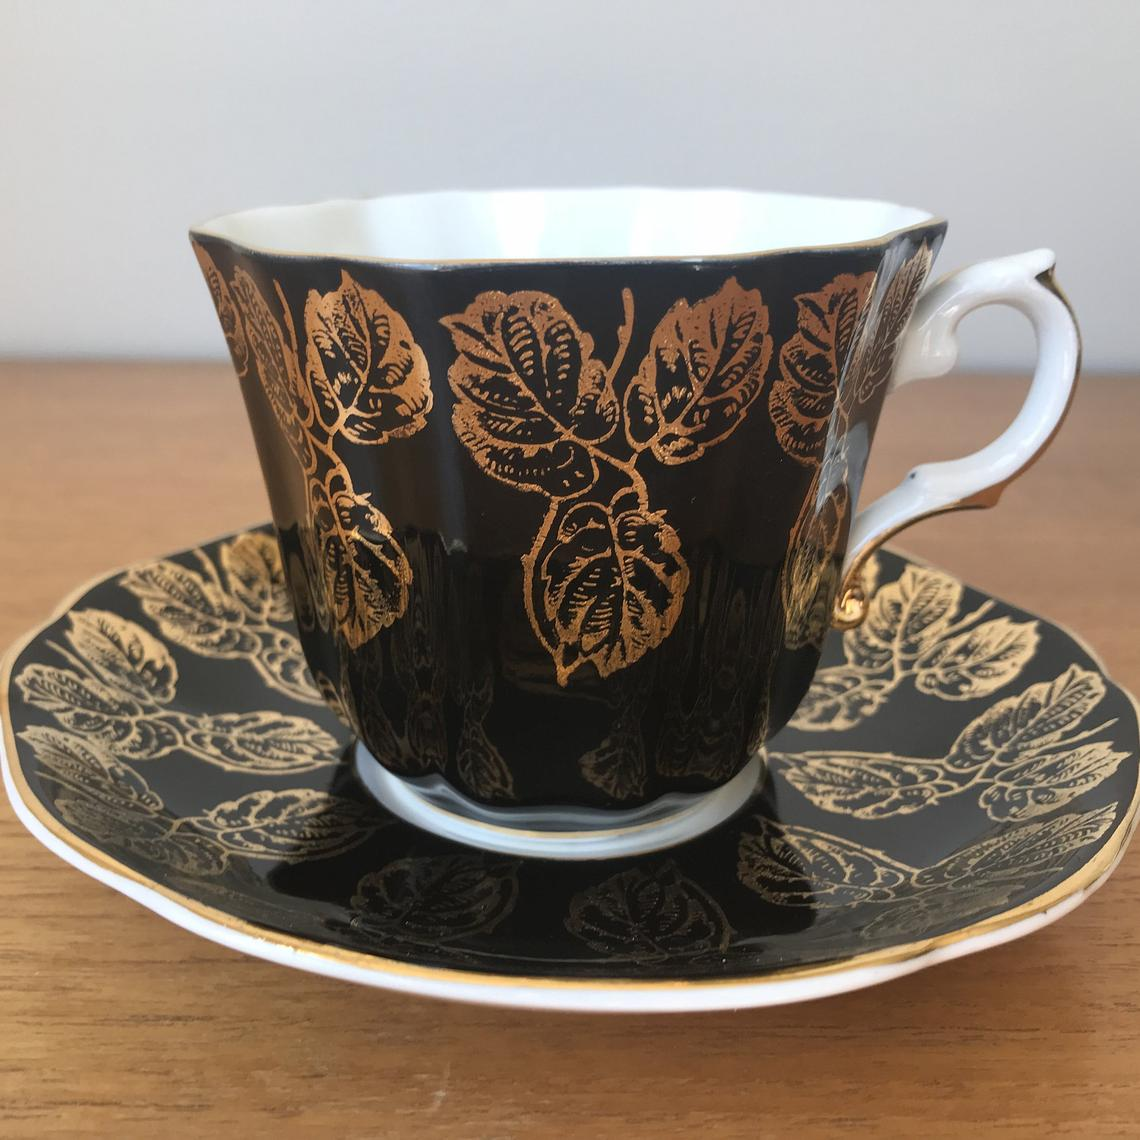 Royal Grafton Black Teacup and Saucer, Gold Leaf Tea Cup and Saucer, Vintage Bone China